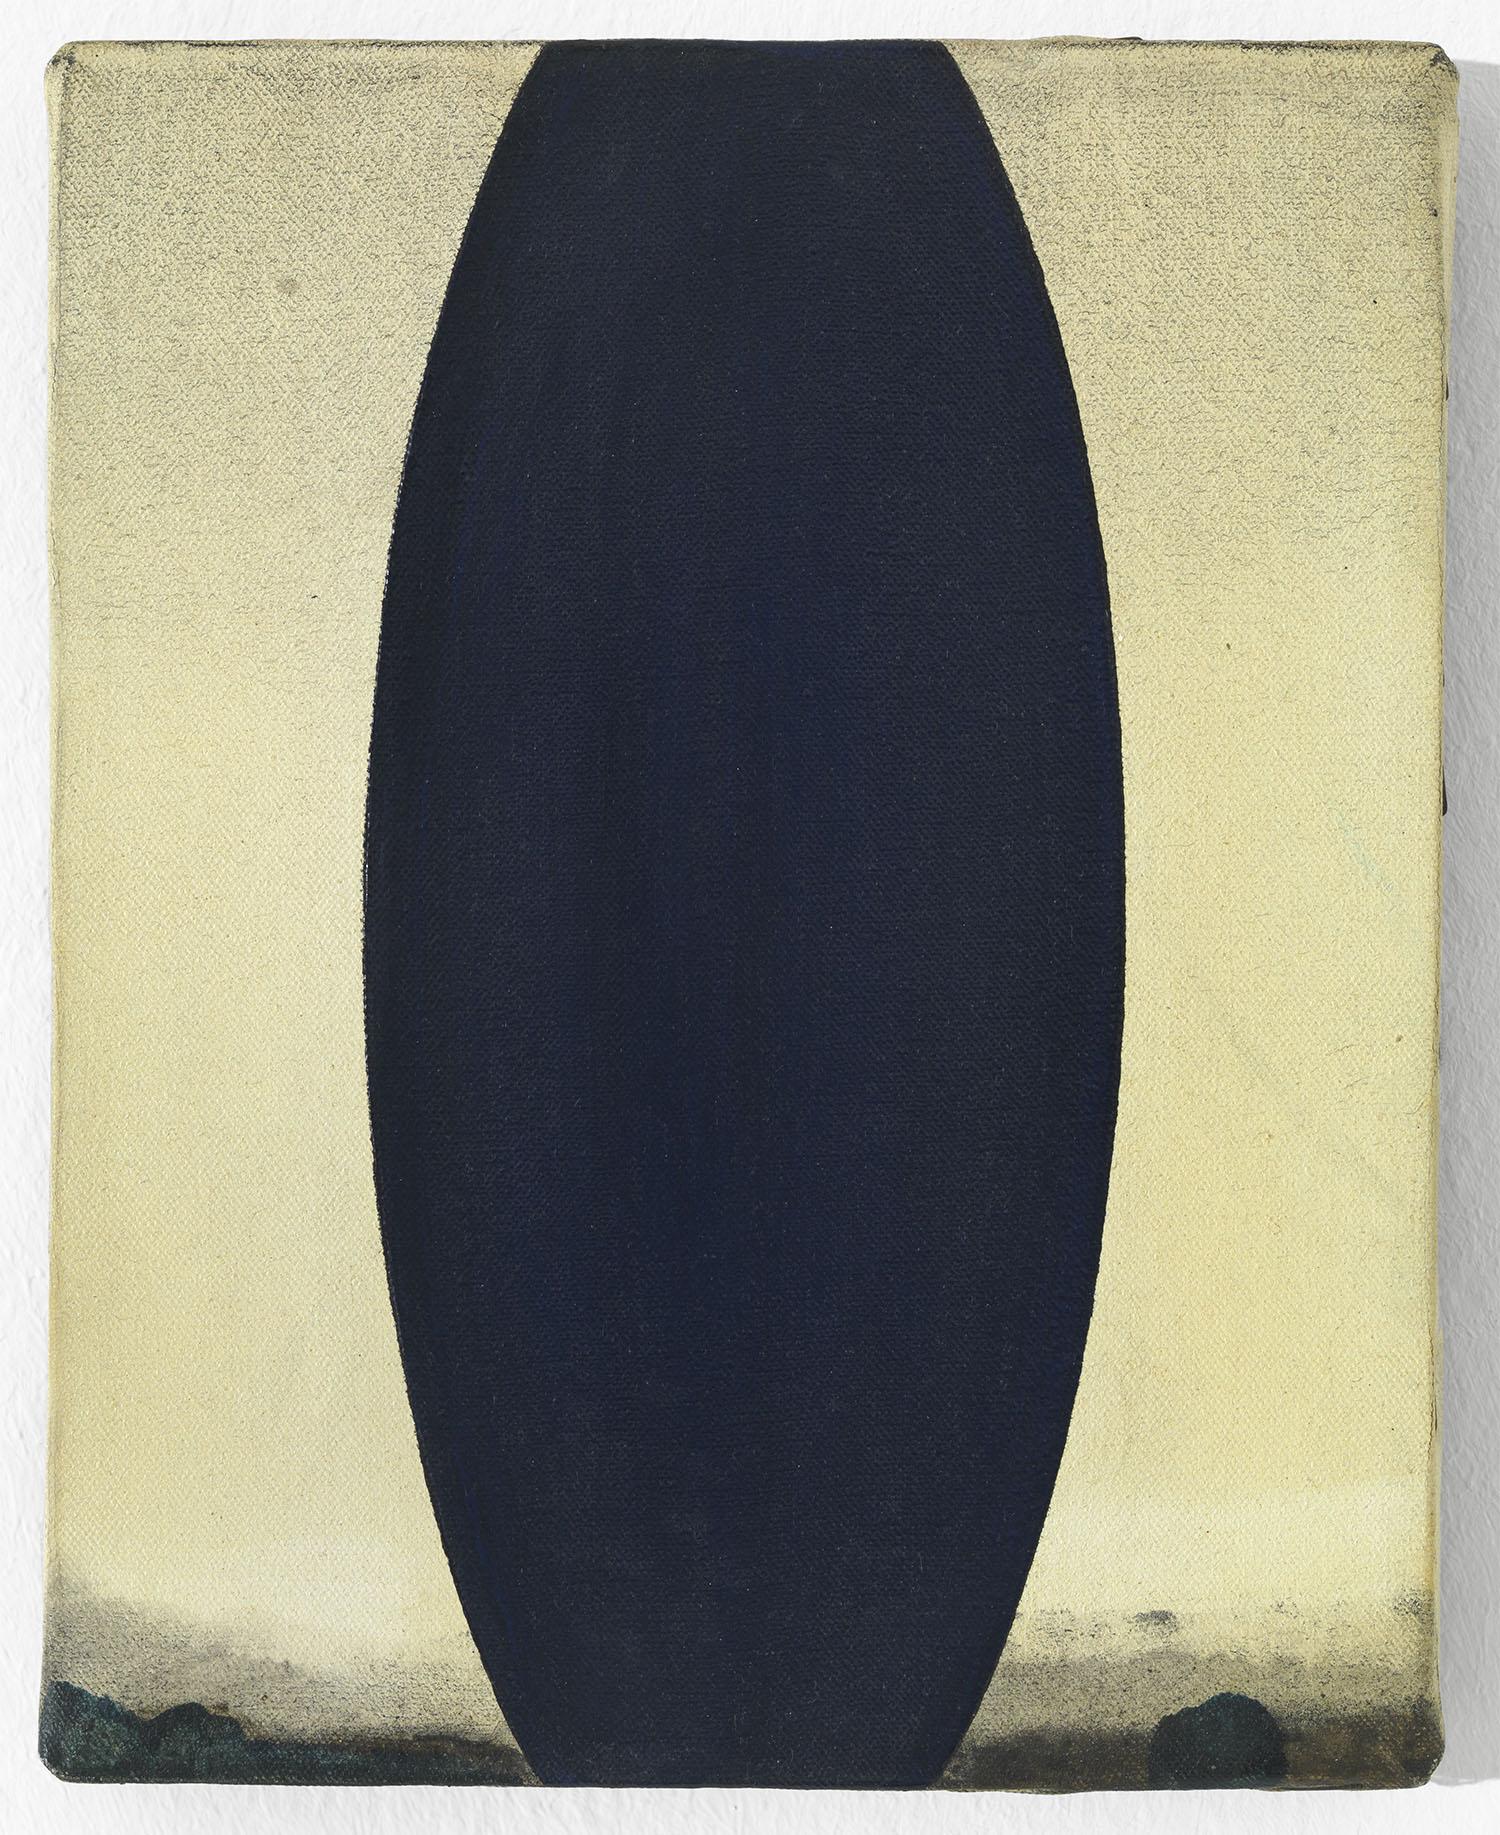 o.T. | 1987 | Öl auf Leinwand | 25 x 20 cm